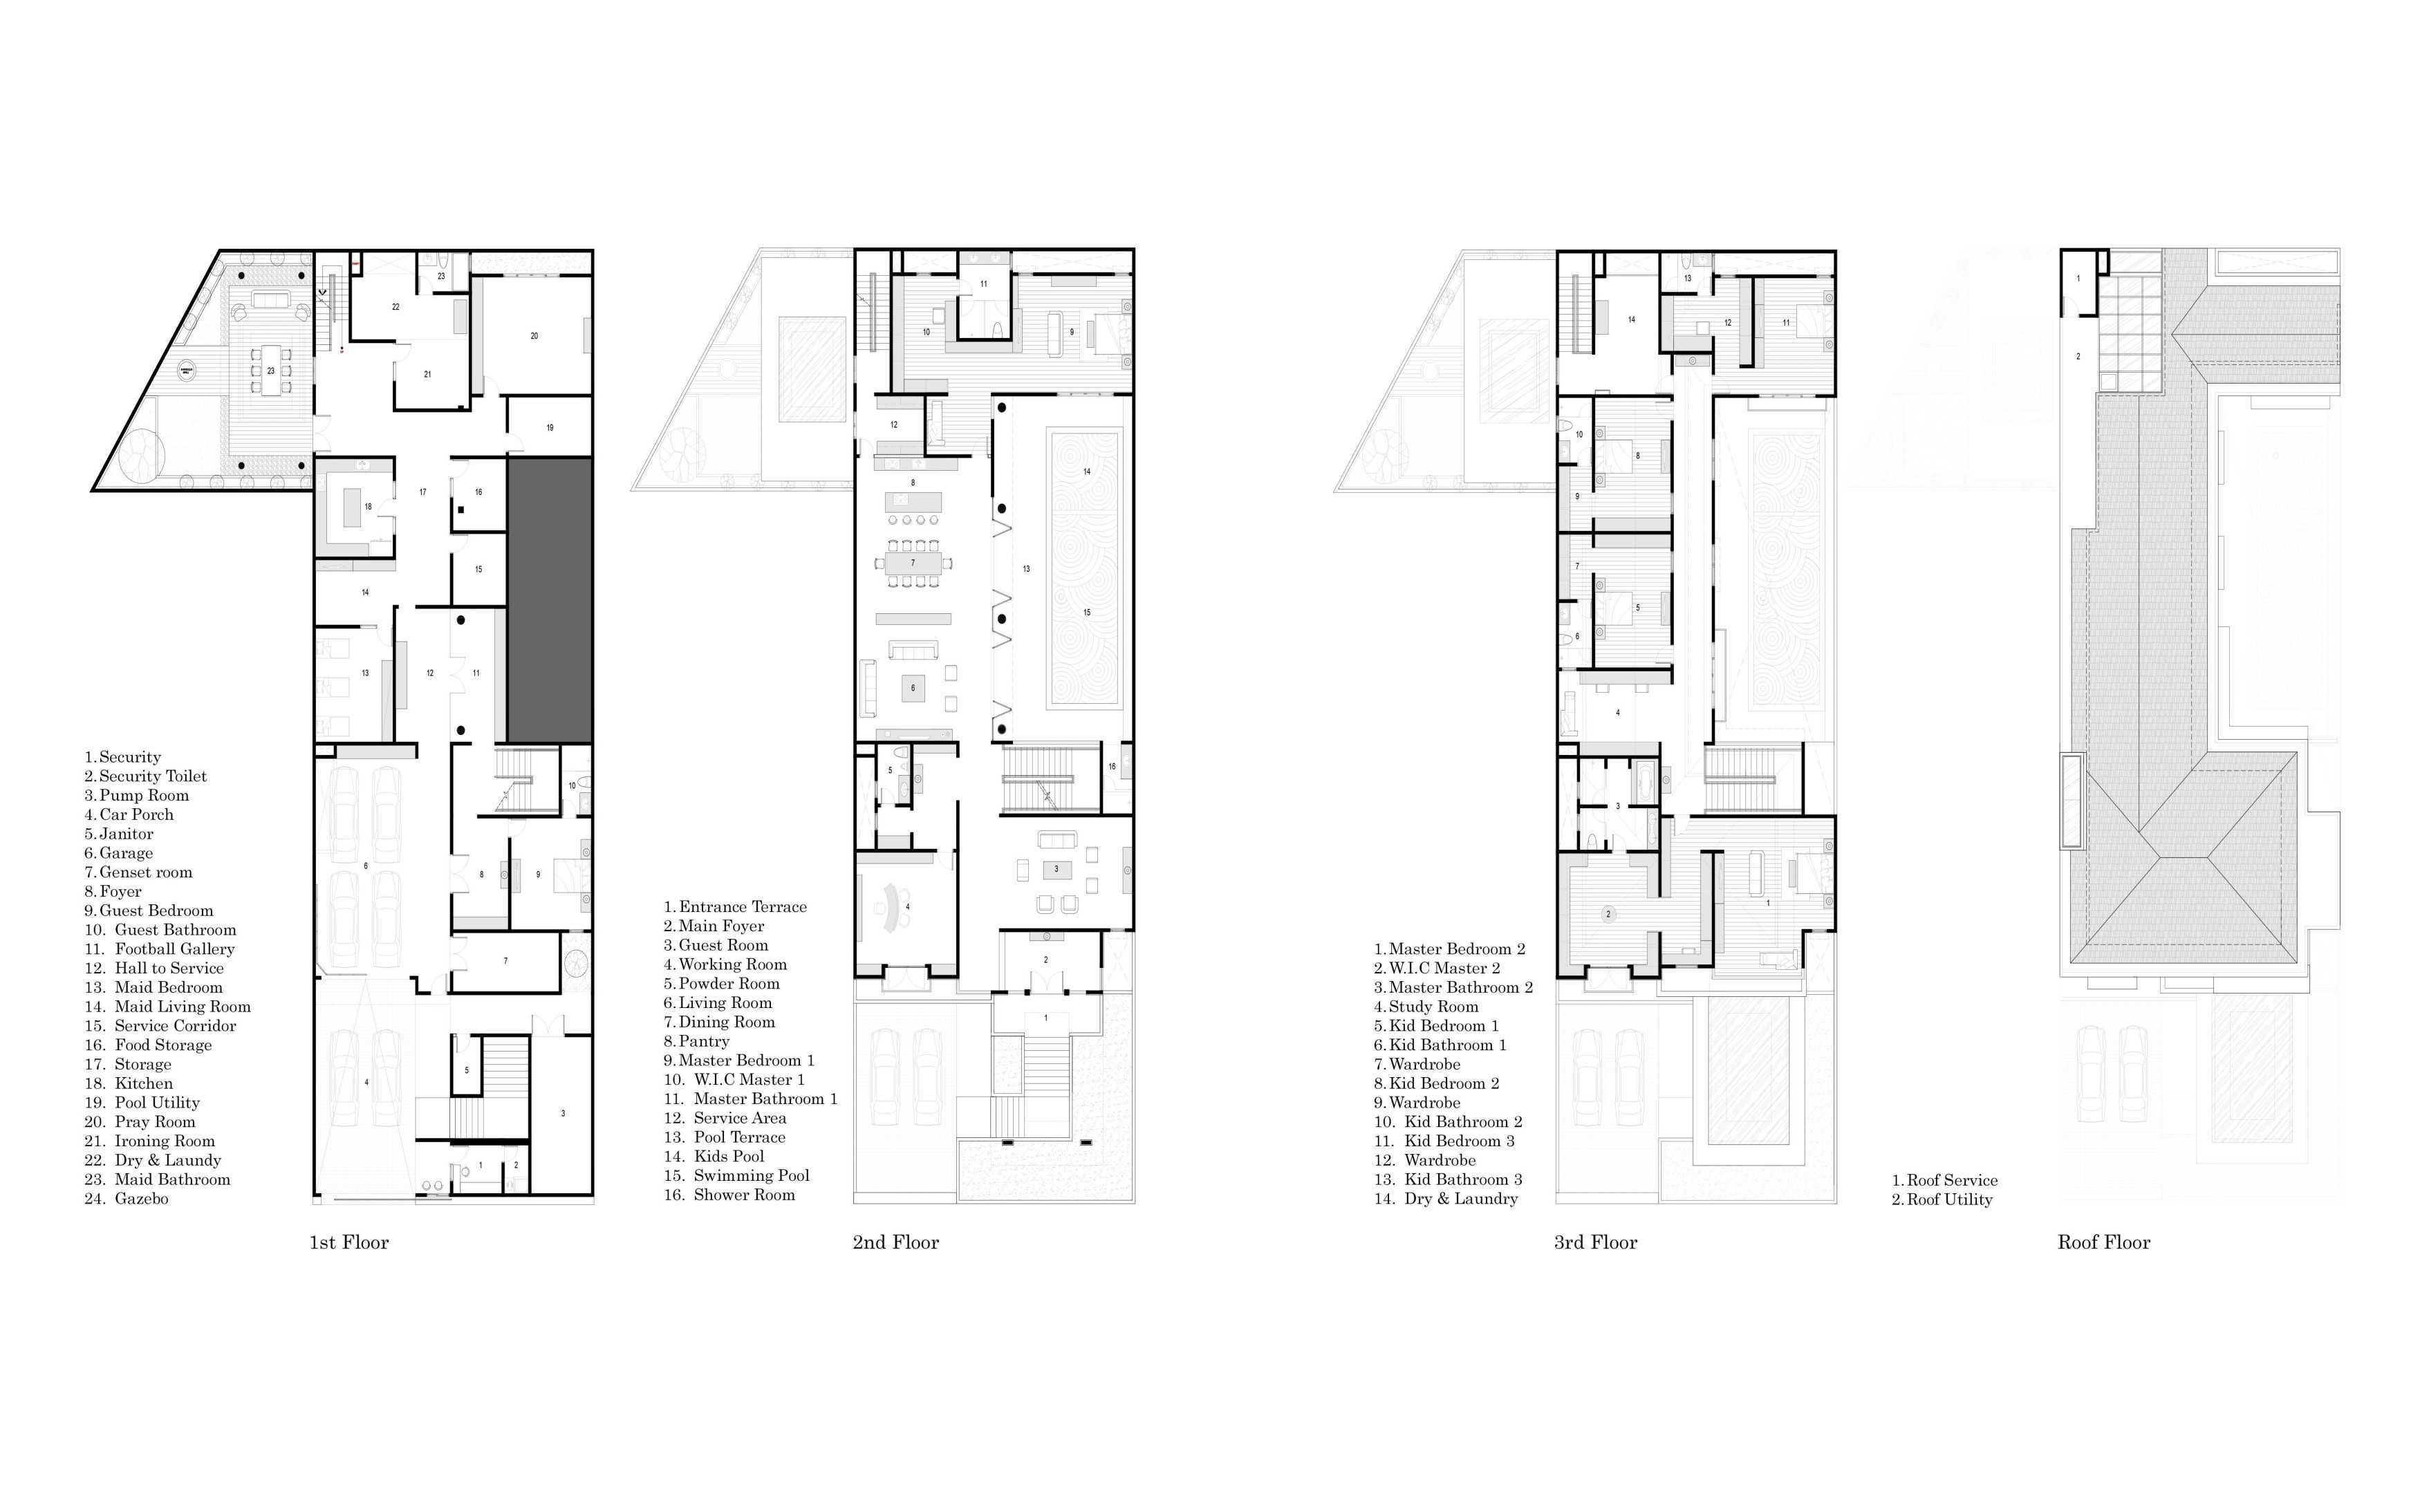 Subject Architecture Project Baubau Bau-Bau, Murhum, Kota Bau-Bau, Sulawesi Tenggara, Indonesia Bau-Bau, Murhum, Kota Bau-Bau, Sulawesi Tenggara, Indonesia Layout Modern  76932